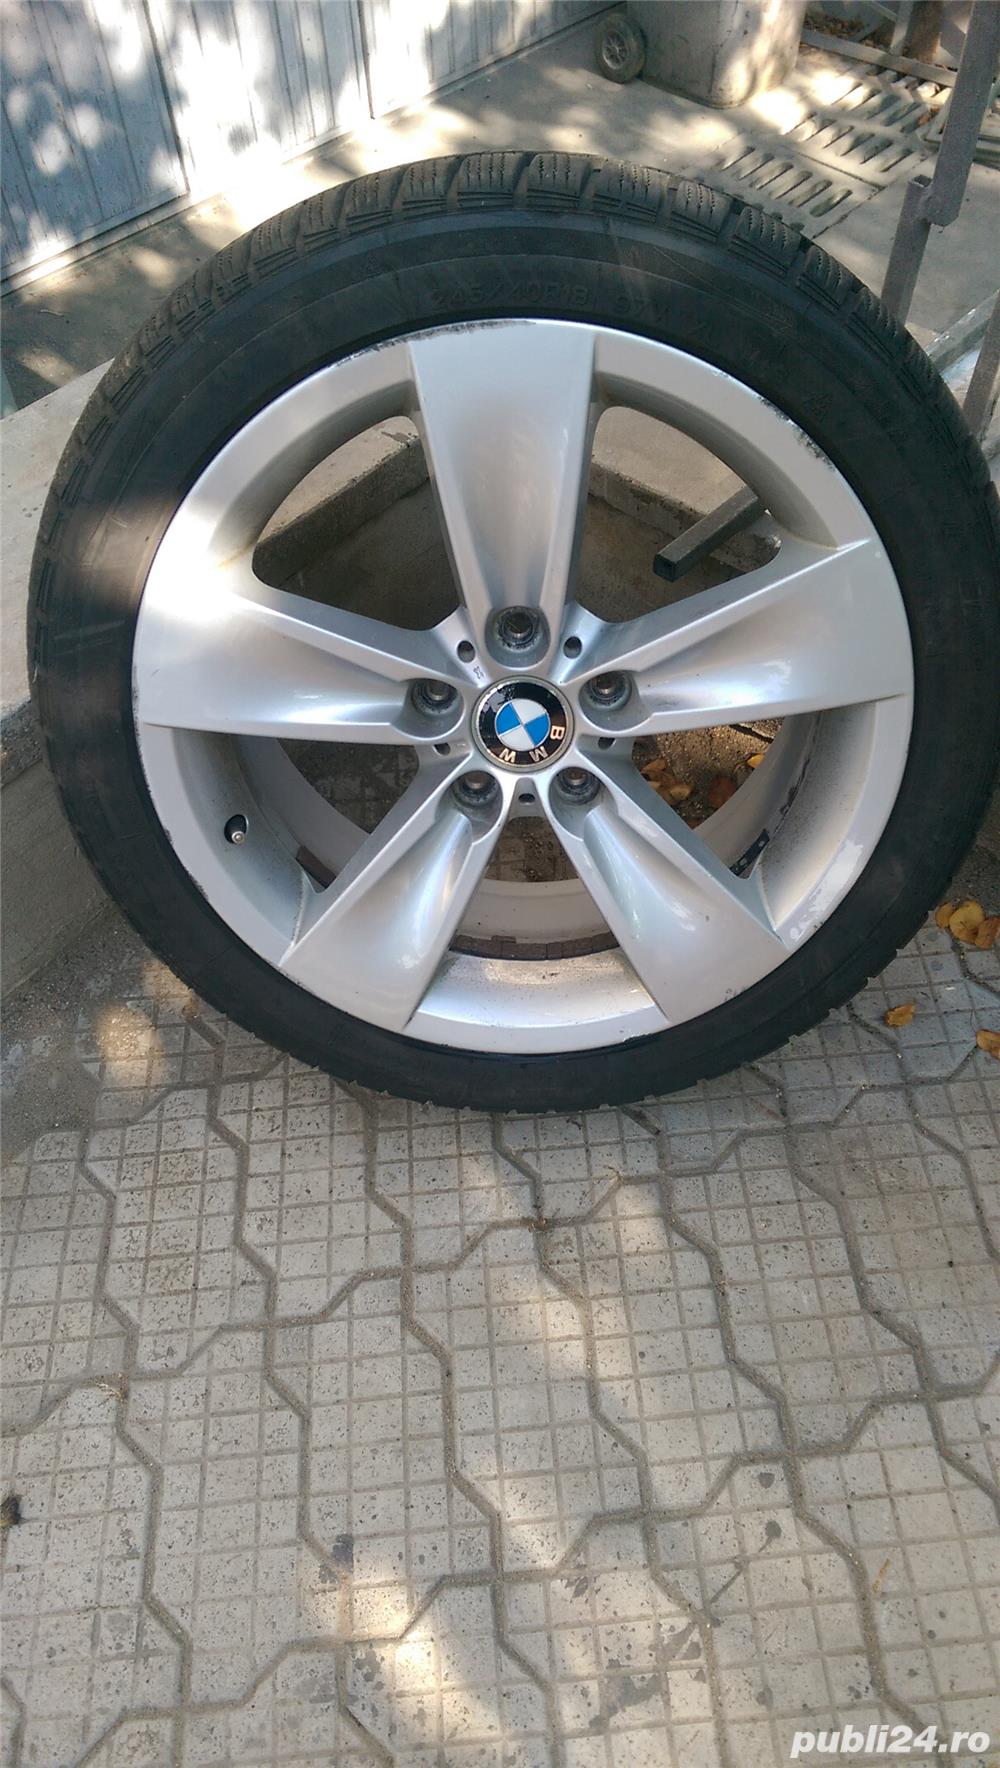 Jante aliaj - BMW echipate cu cauciucuri de iarna 245/40/r18